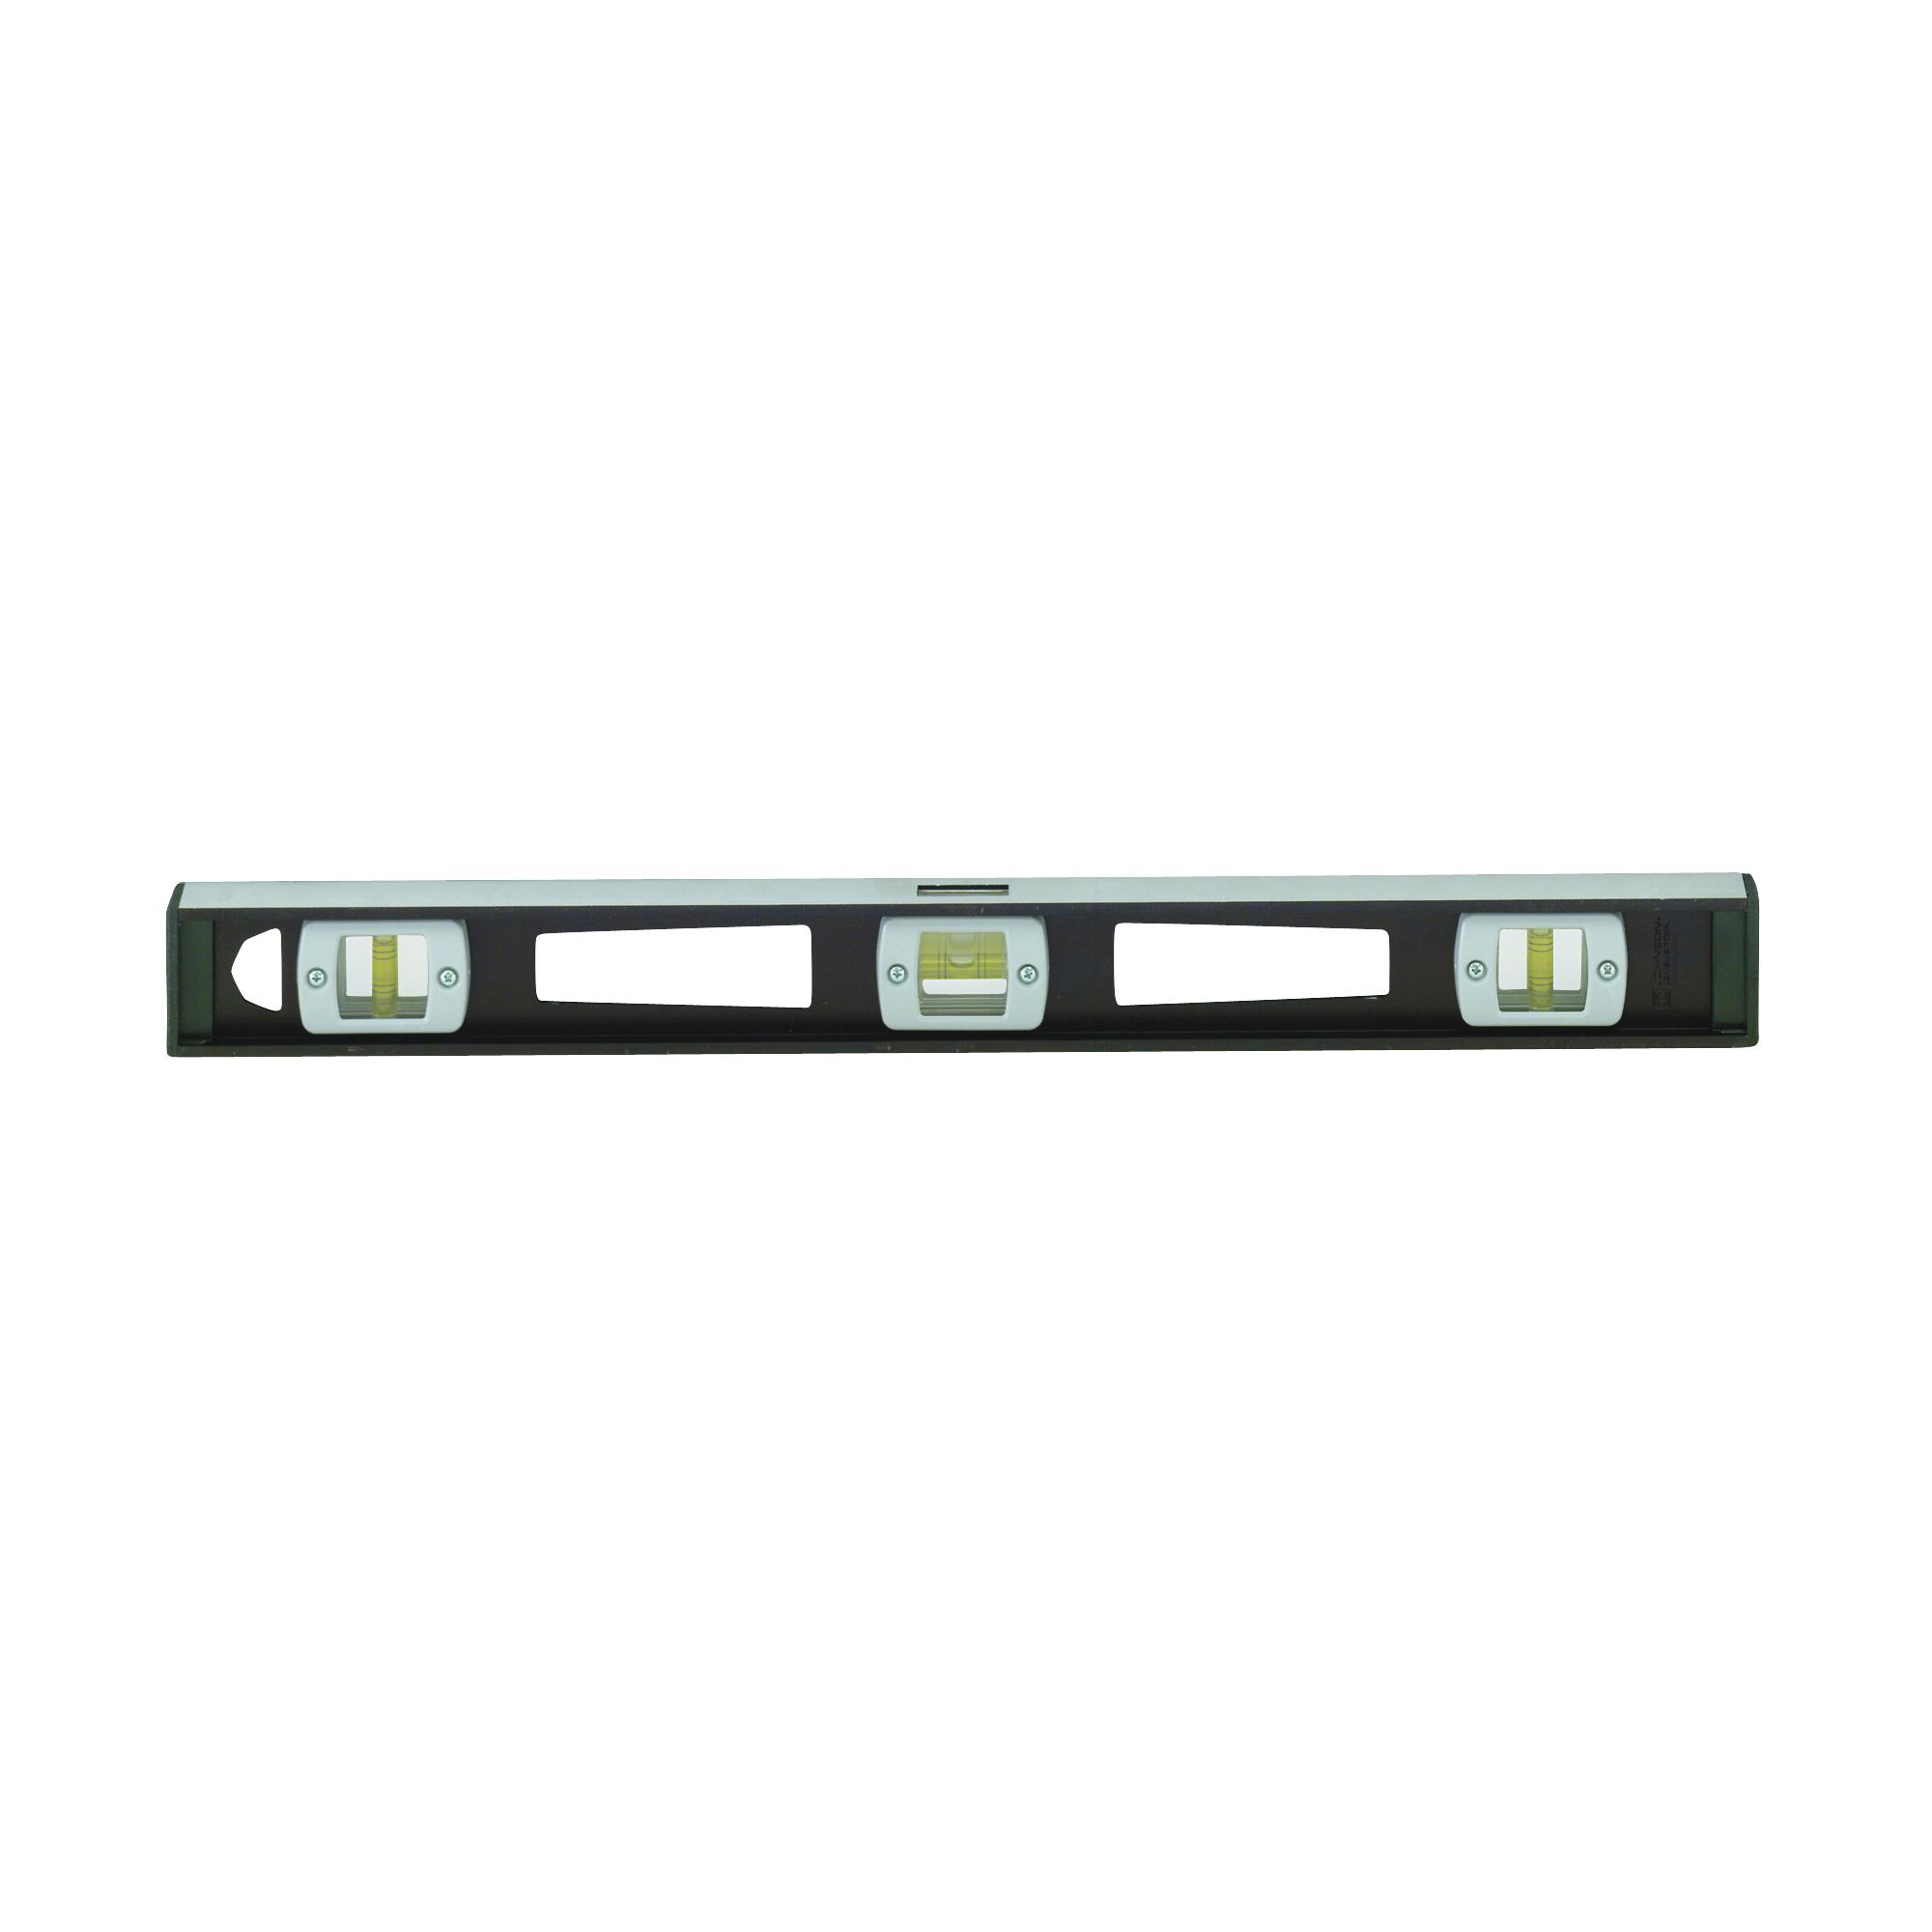 Picture of Johnson 3872 I-Beam Level, 72 in L, 5 -Vial, Magnetic, Aluminum, Black